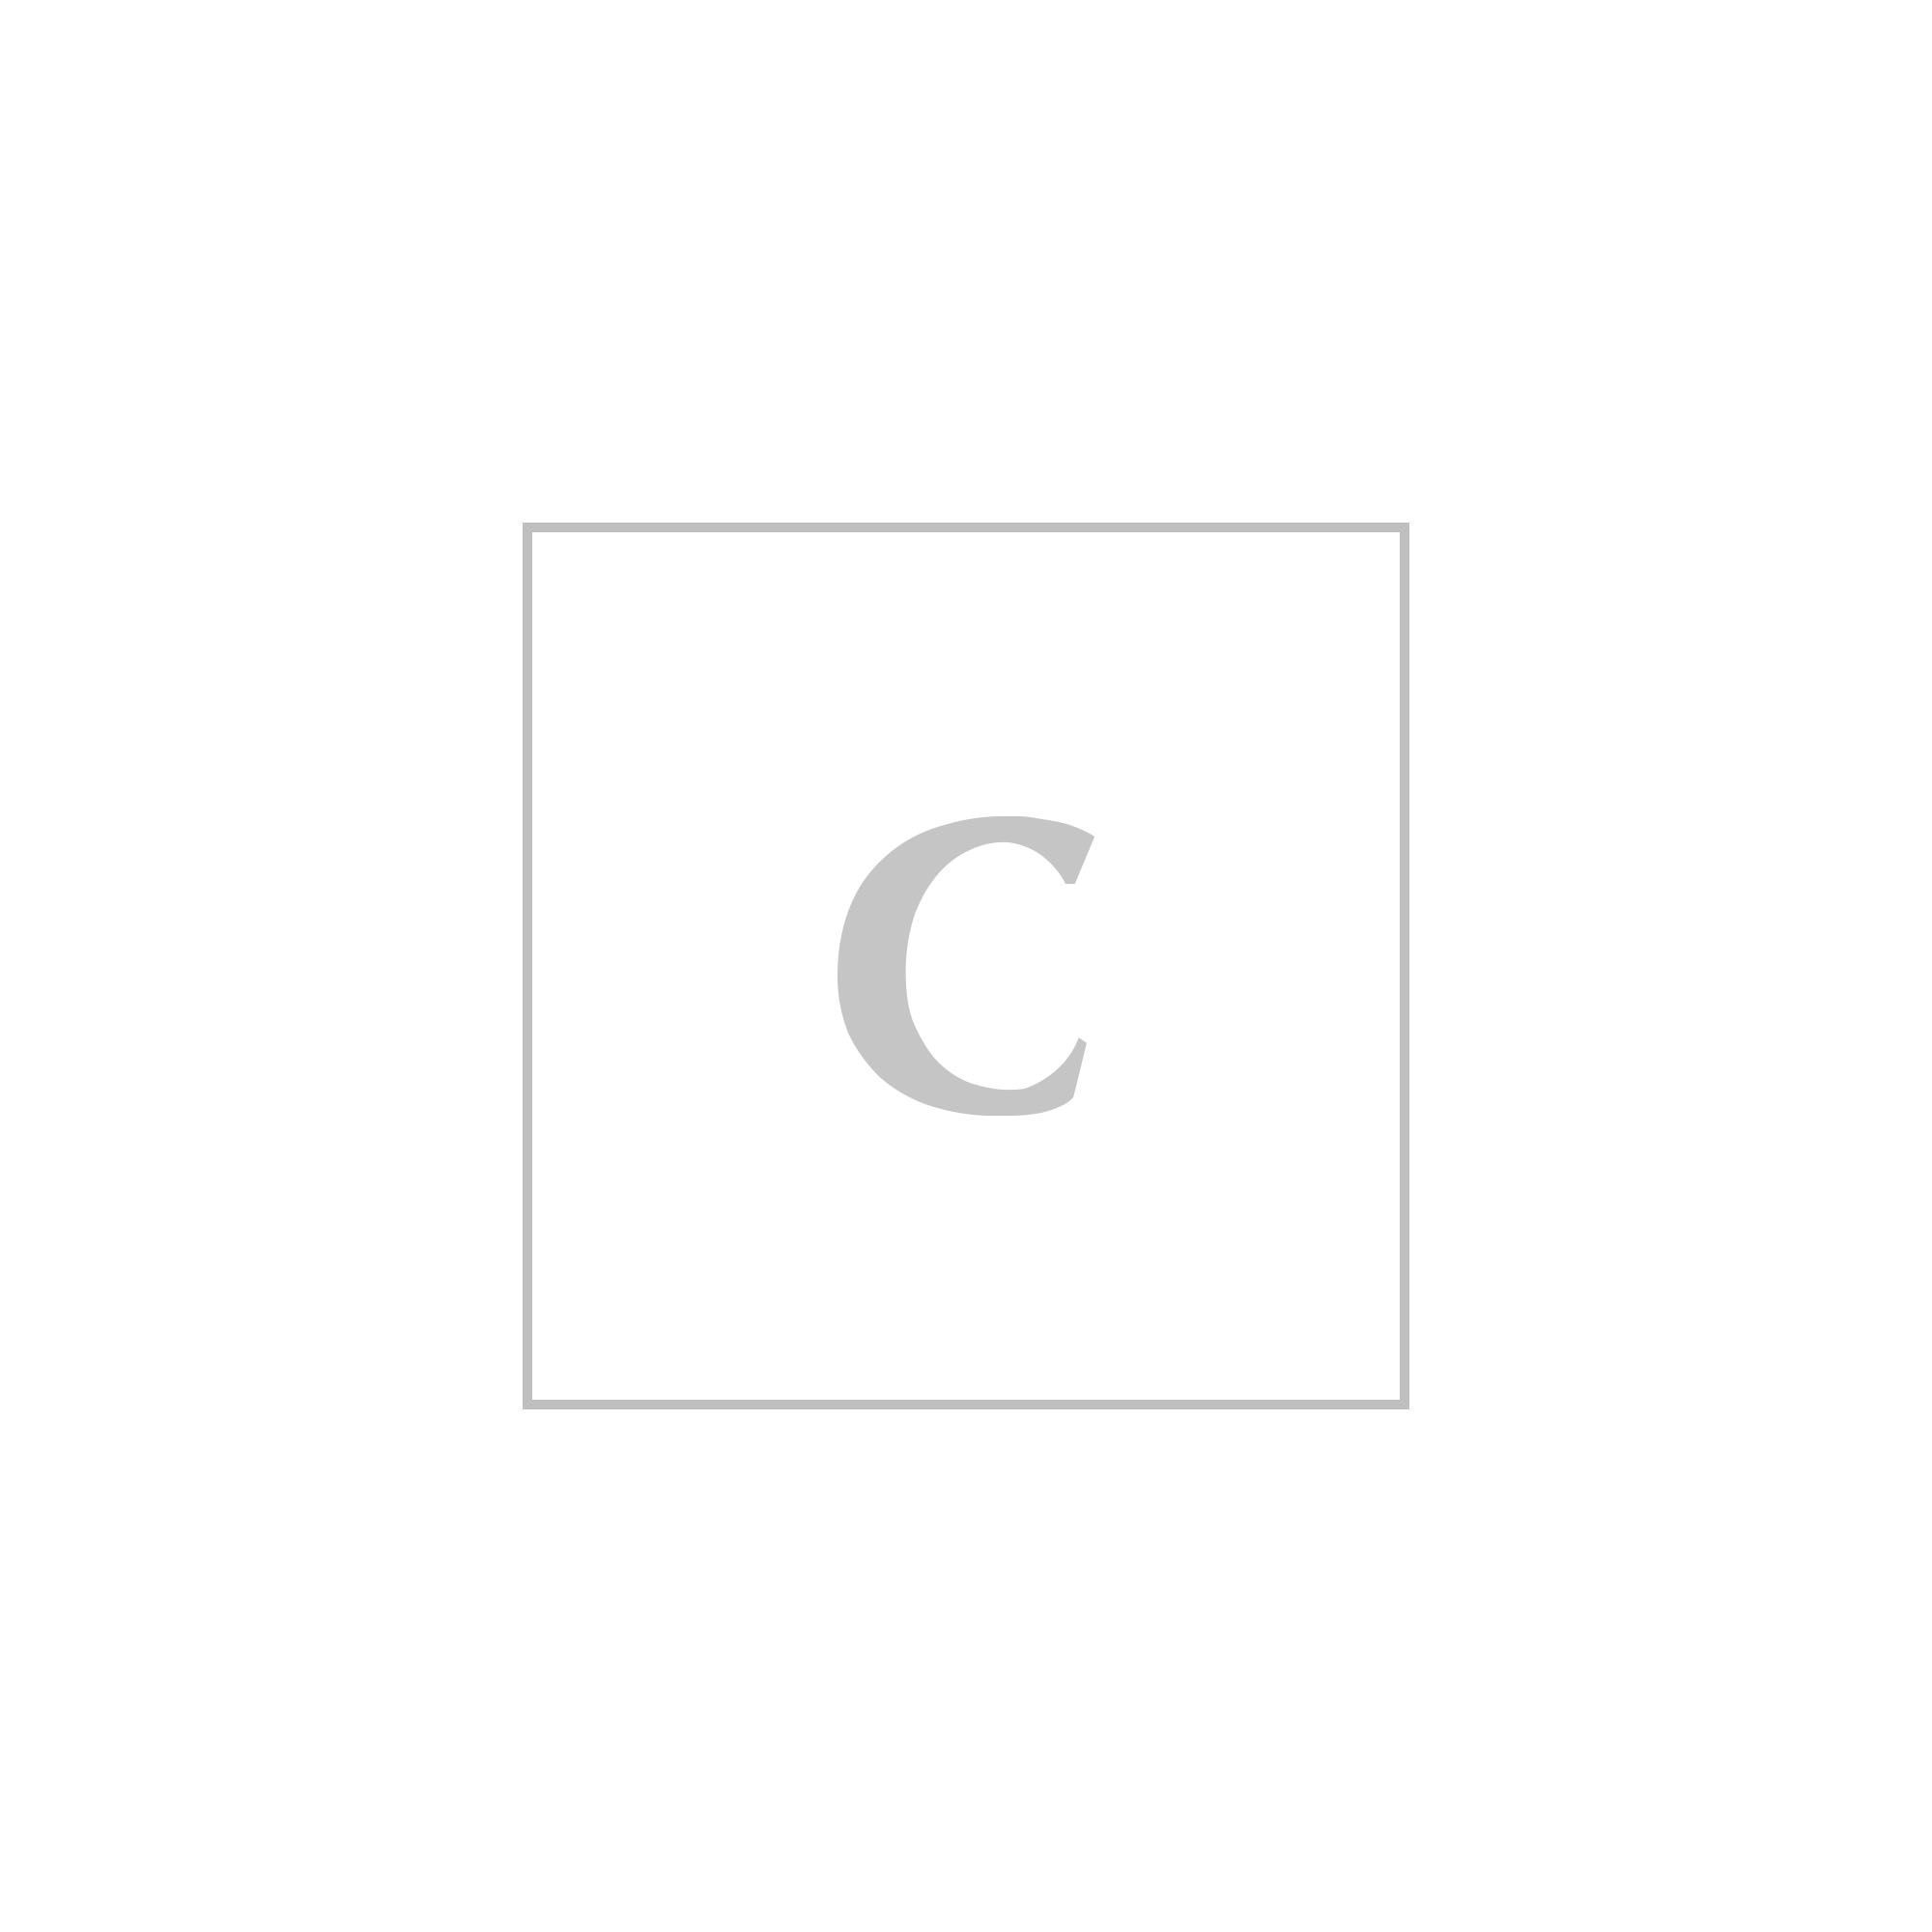 Stella mccartney borsa clutch black star print falabella cross body